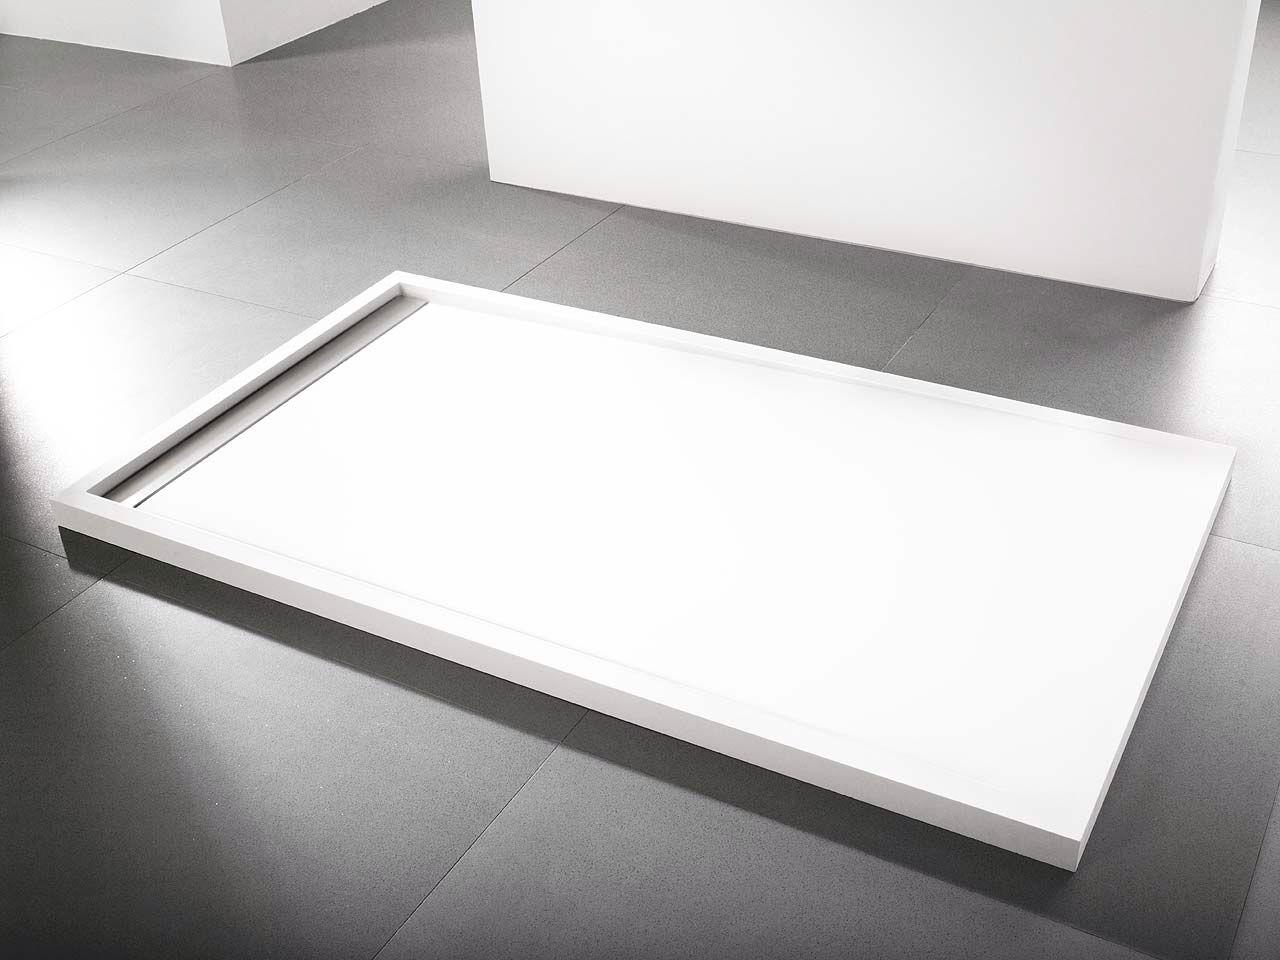 Porcelanosa shower tray | Bathroom Design | Pinterest | Trays ...